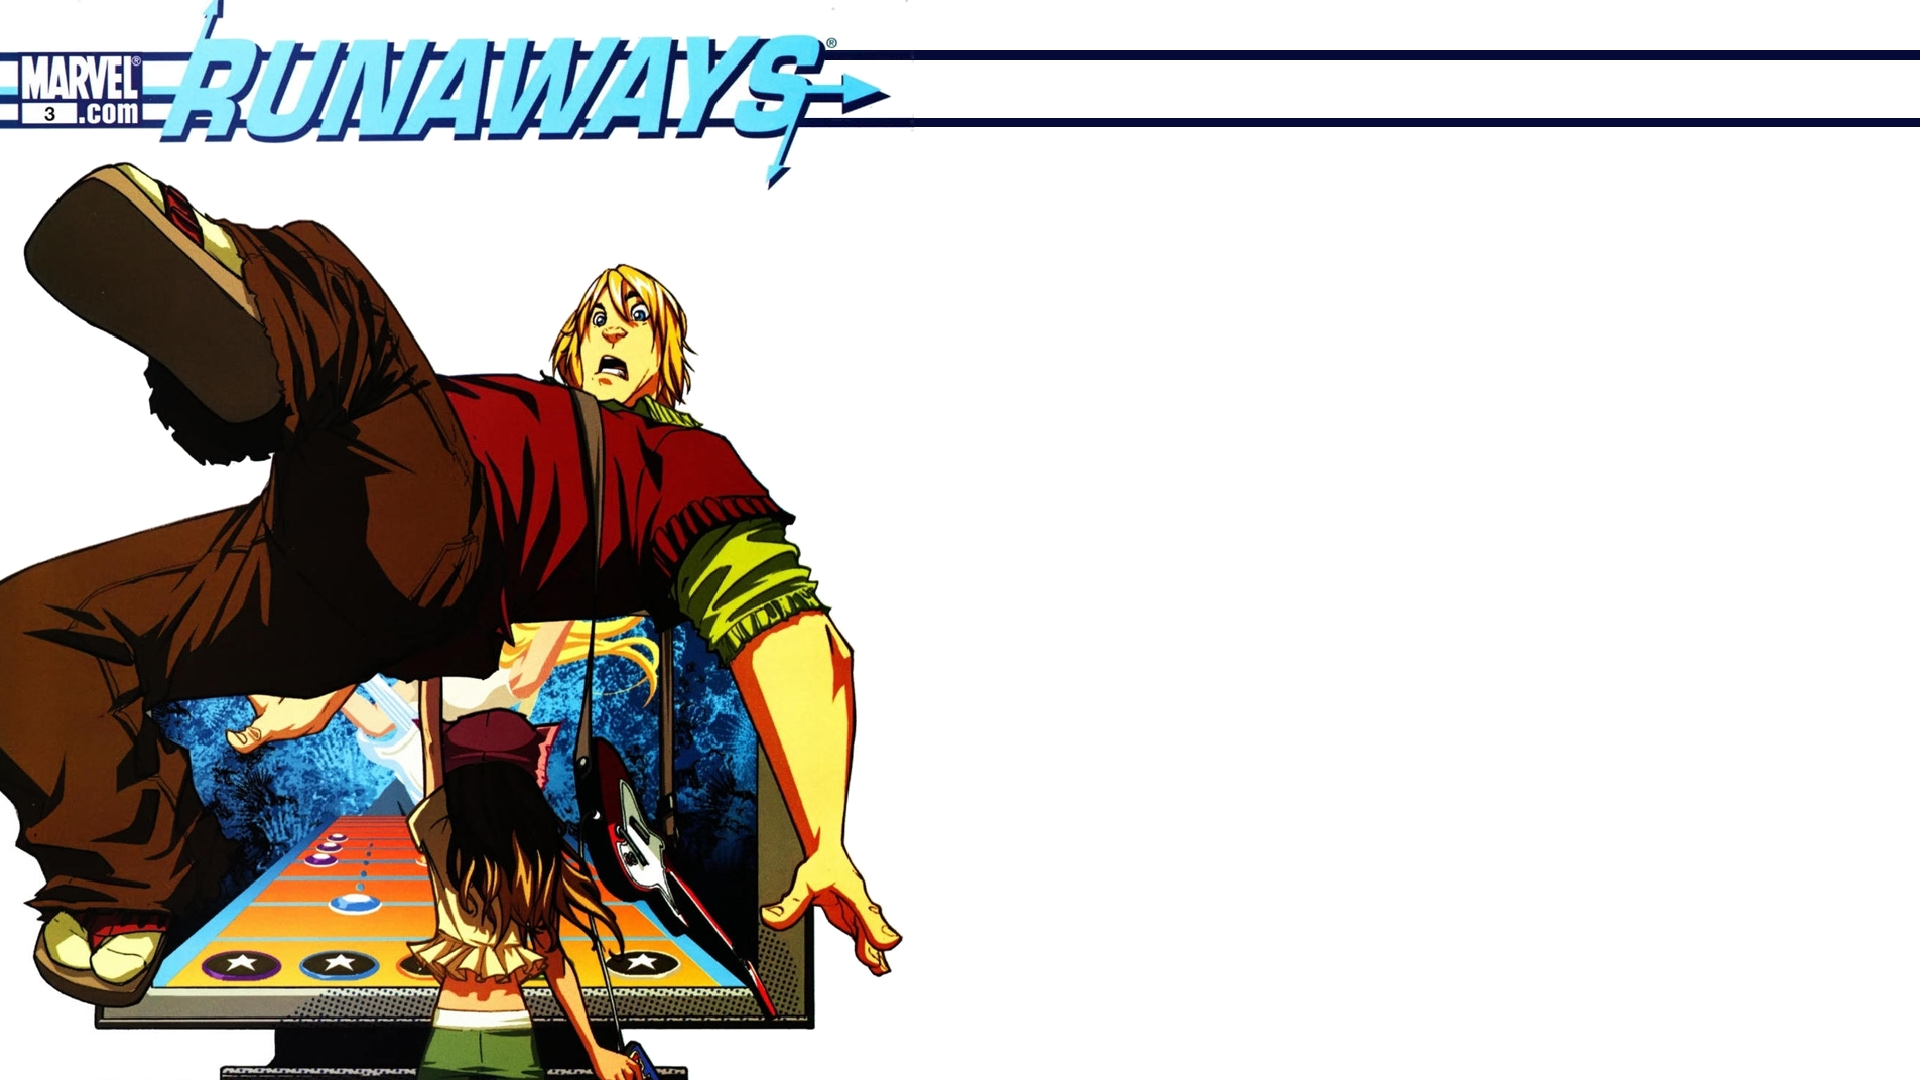 Great Wallpaper Marvel Runaways - 480135  Gallery_85948.jpg